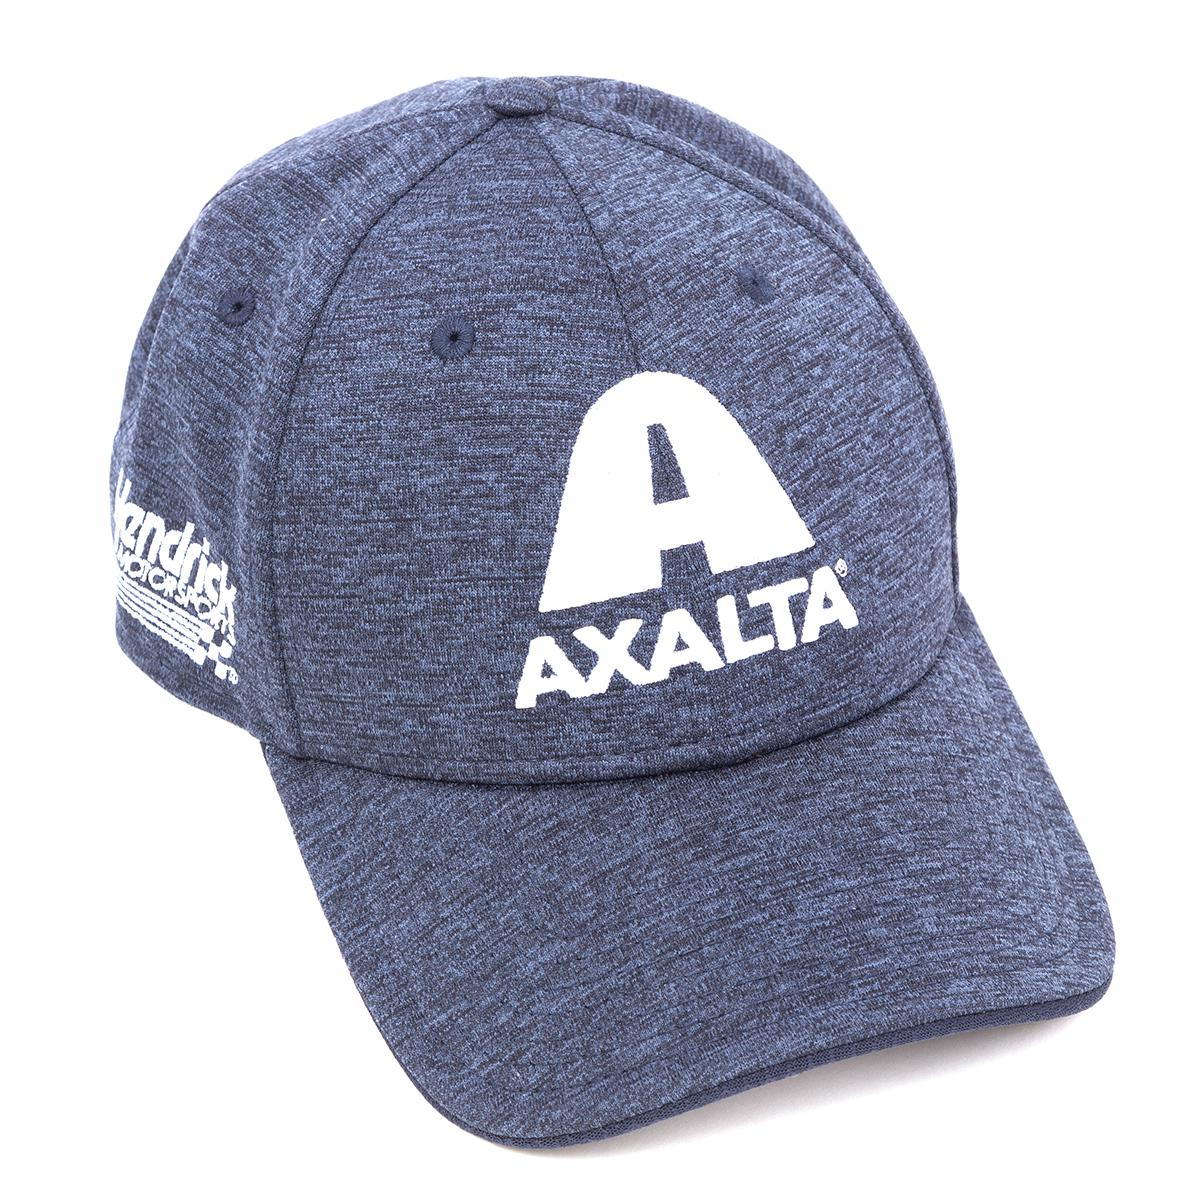 William Byron #24 2018 Axalta Driver 940 Adjustable Hat